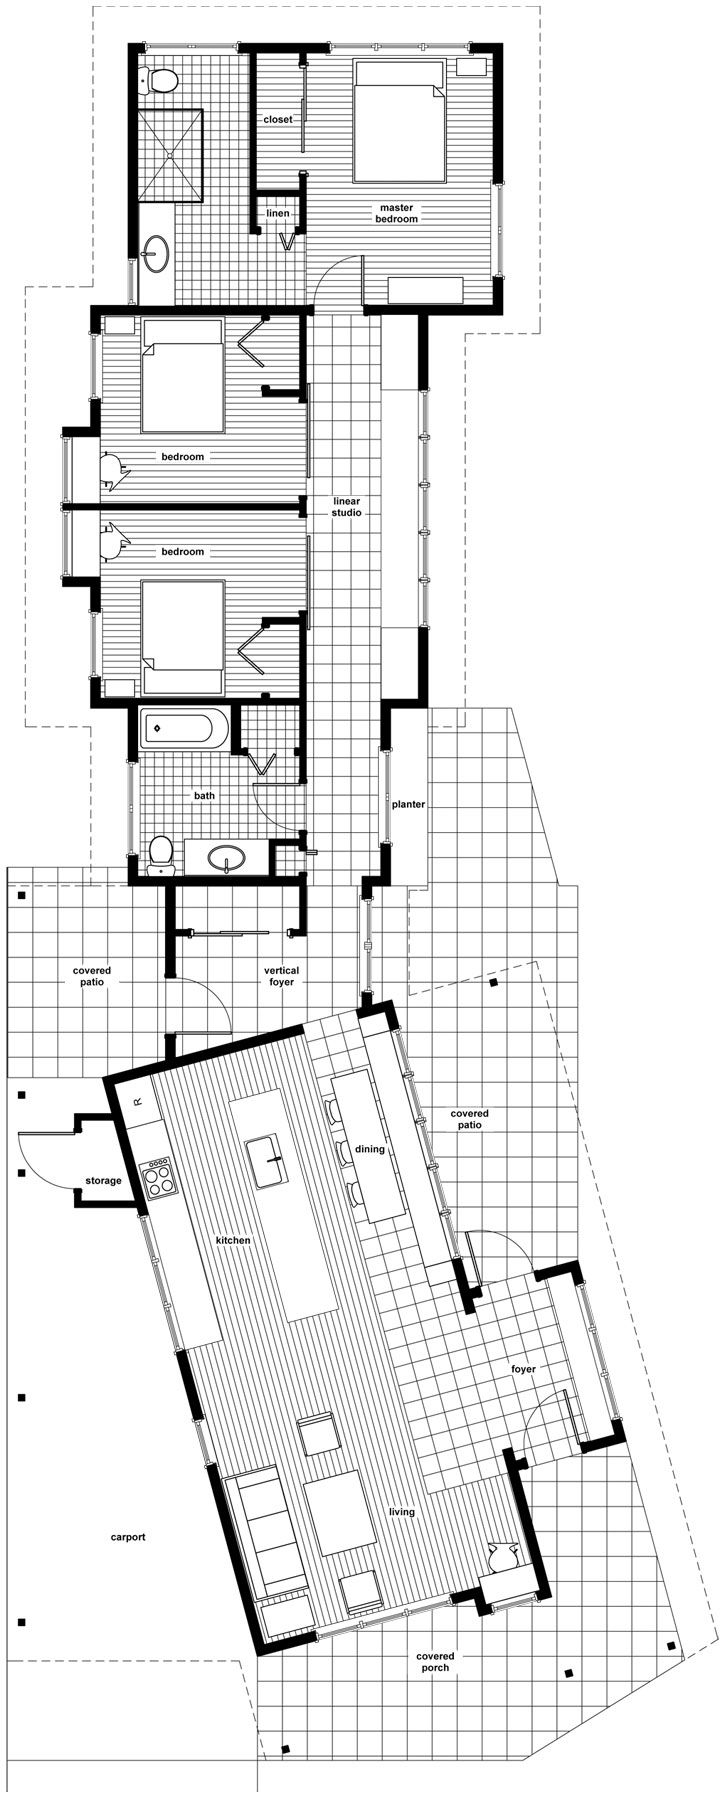 50 Best Angular Architecture Images On Pinterest Floor